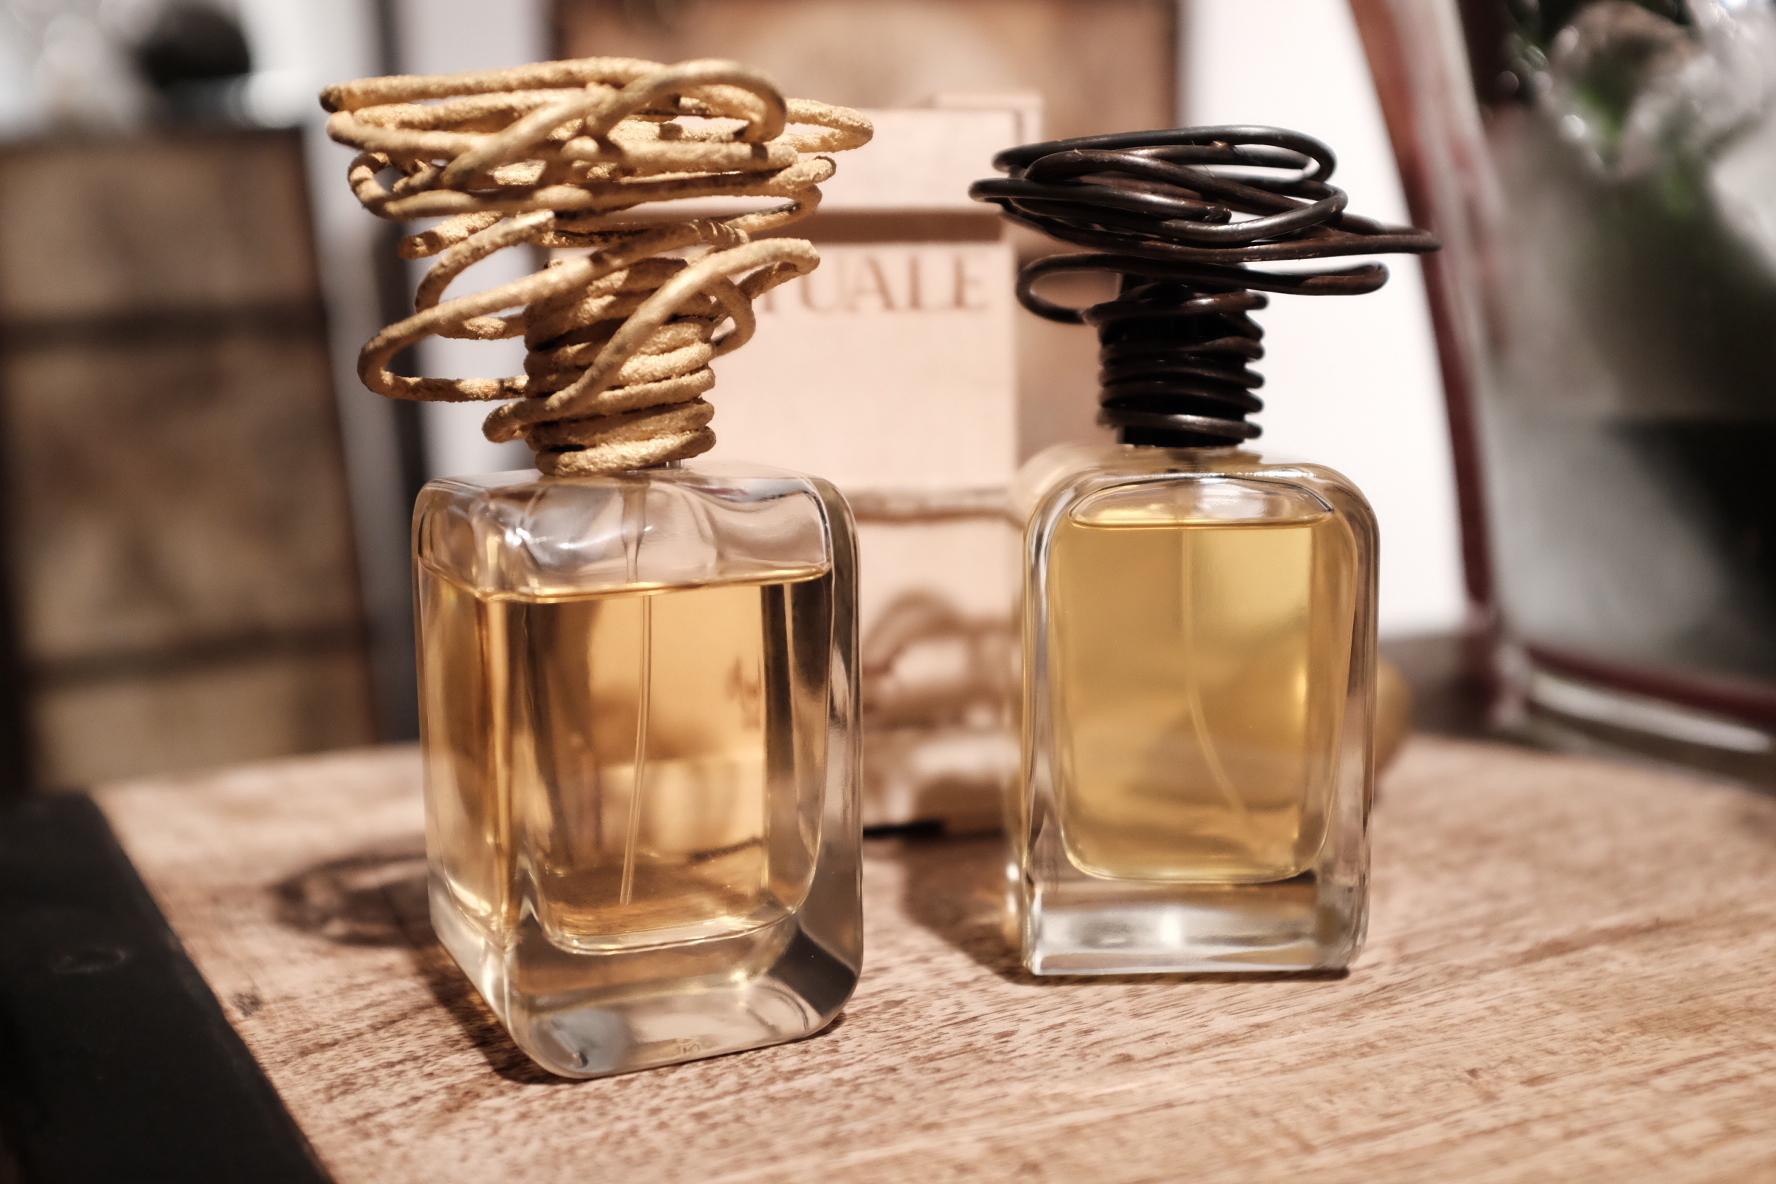 Mendittorosa perfumes